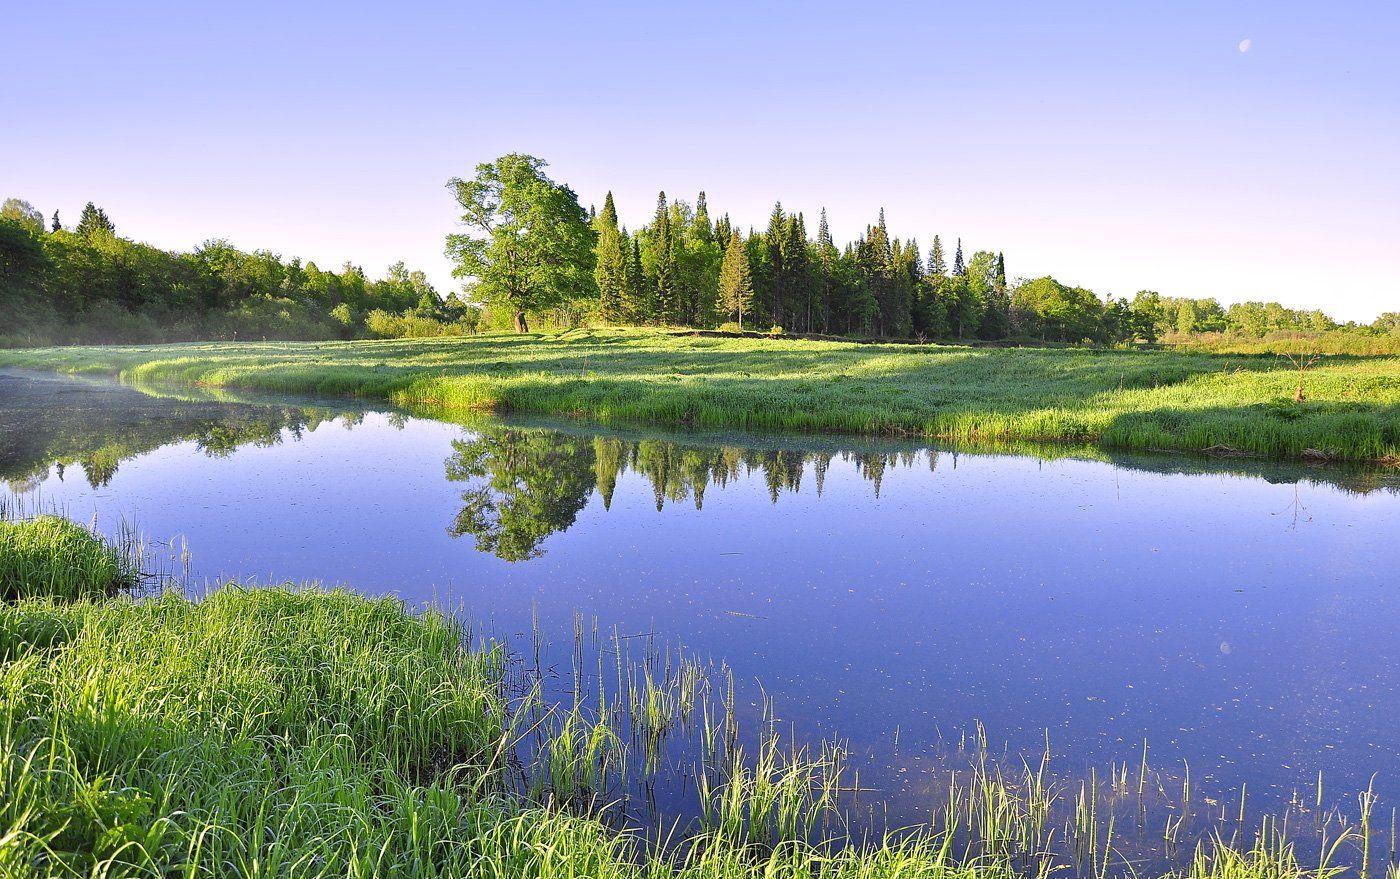 удмуртия,кез,пейзаж,река чепца,май, АНДРЕЙ LOZHKIN